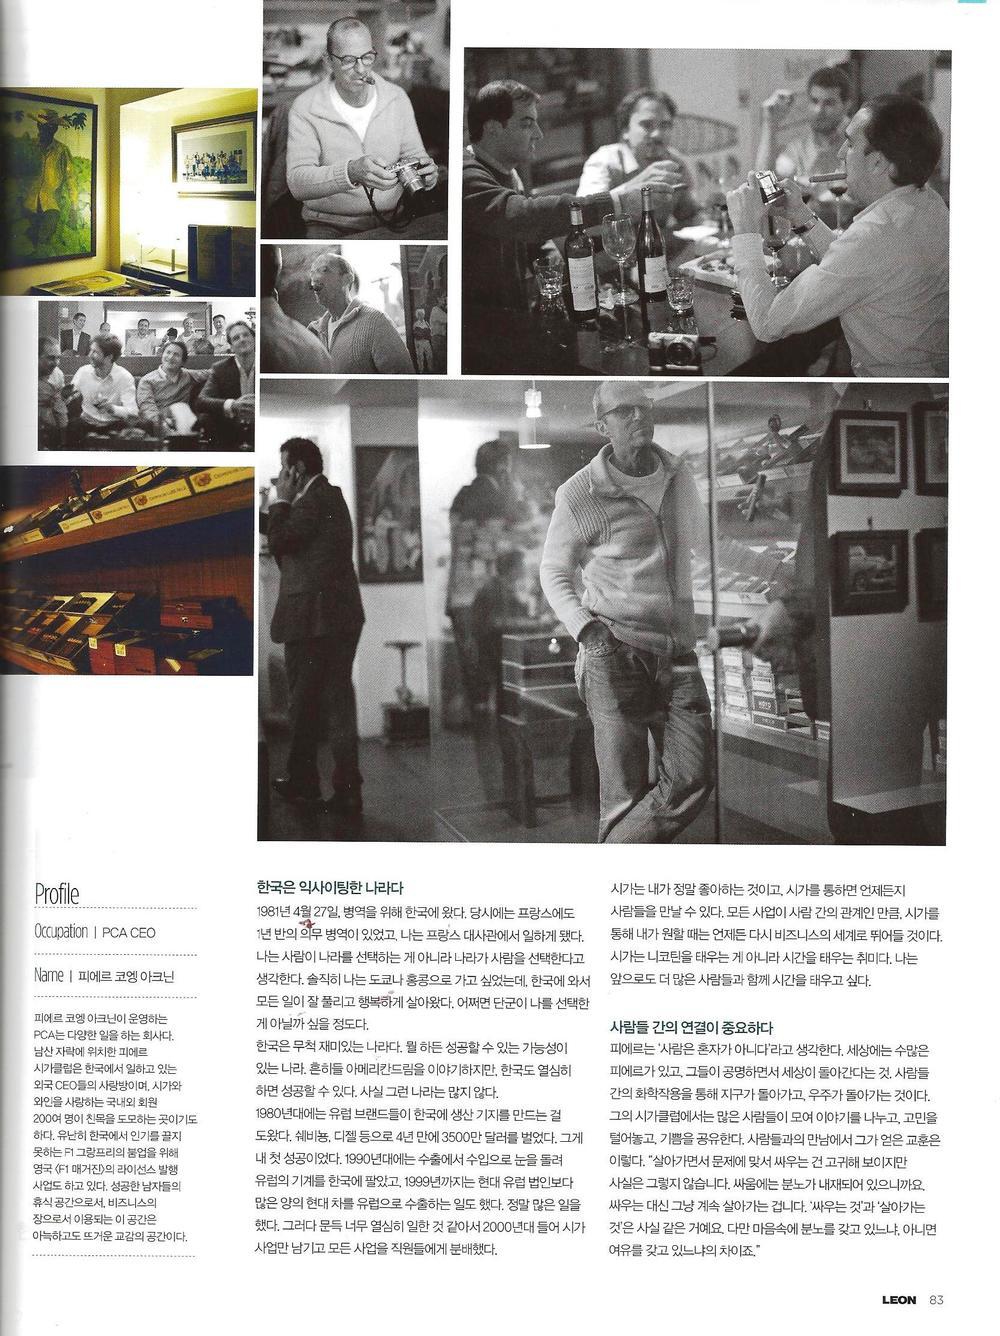 2012-3 Leon article 2.jpg